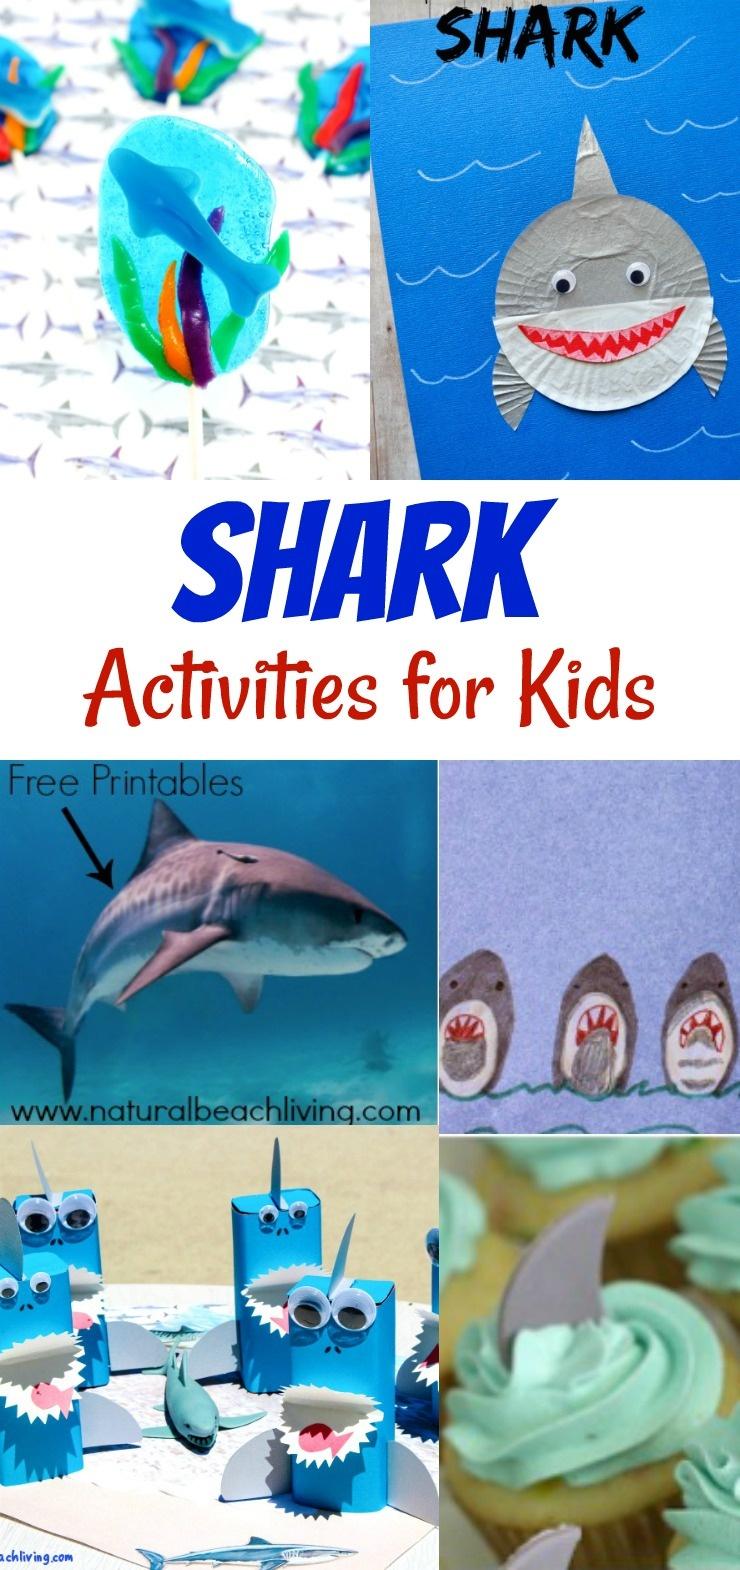 Shark Activities For Kids - Free Shark Printables - Natural Beach Living - Free Shark Printables